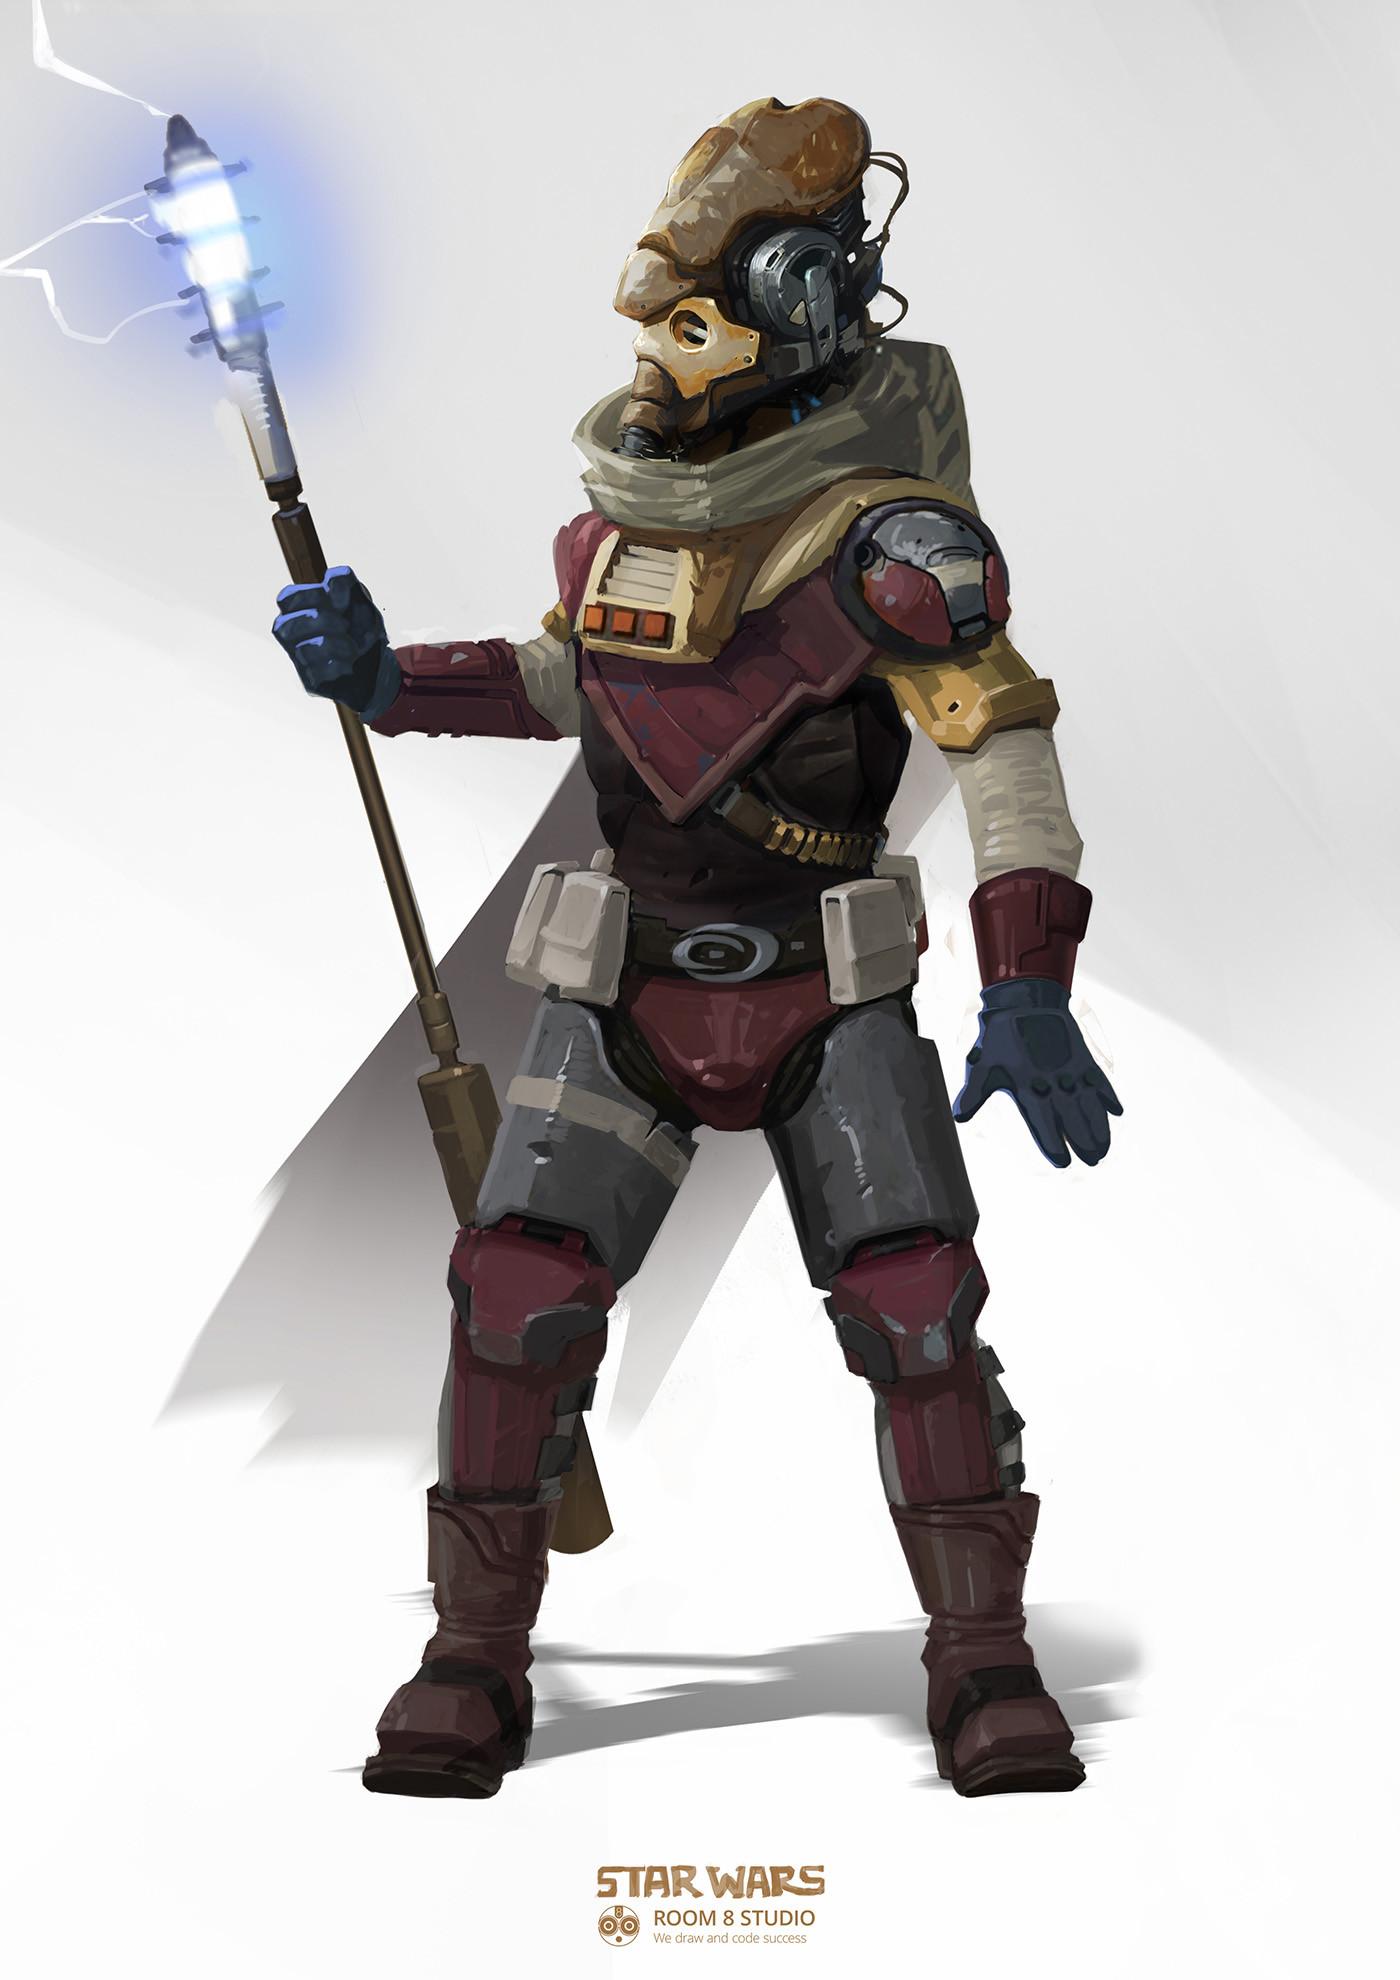 stanislaw-loonin-star-wars-character-6.j